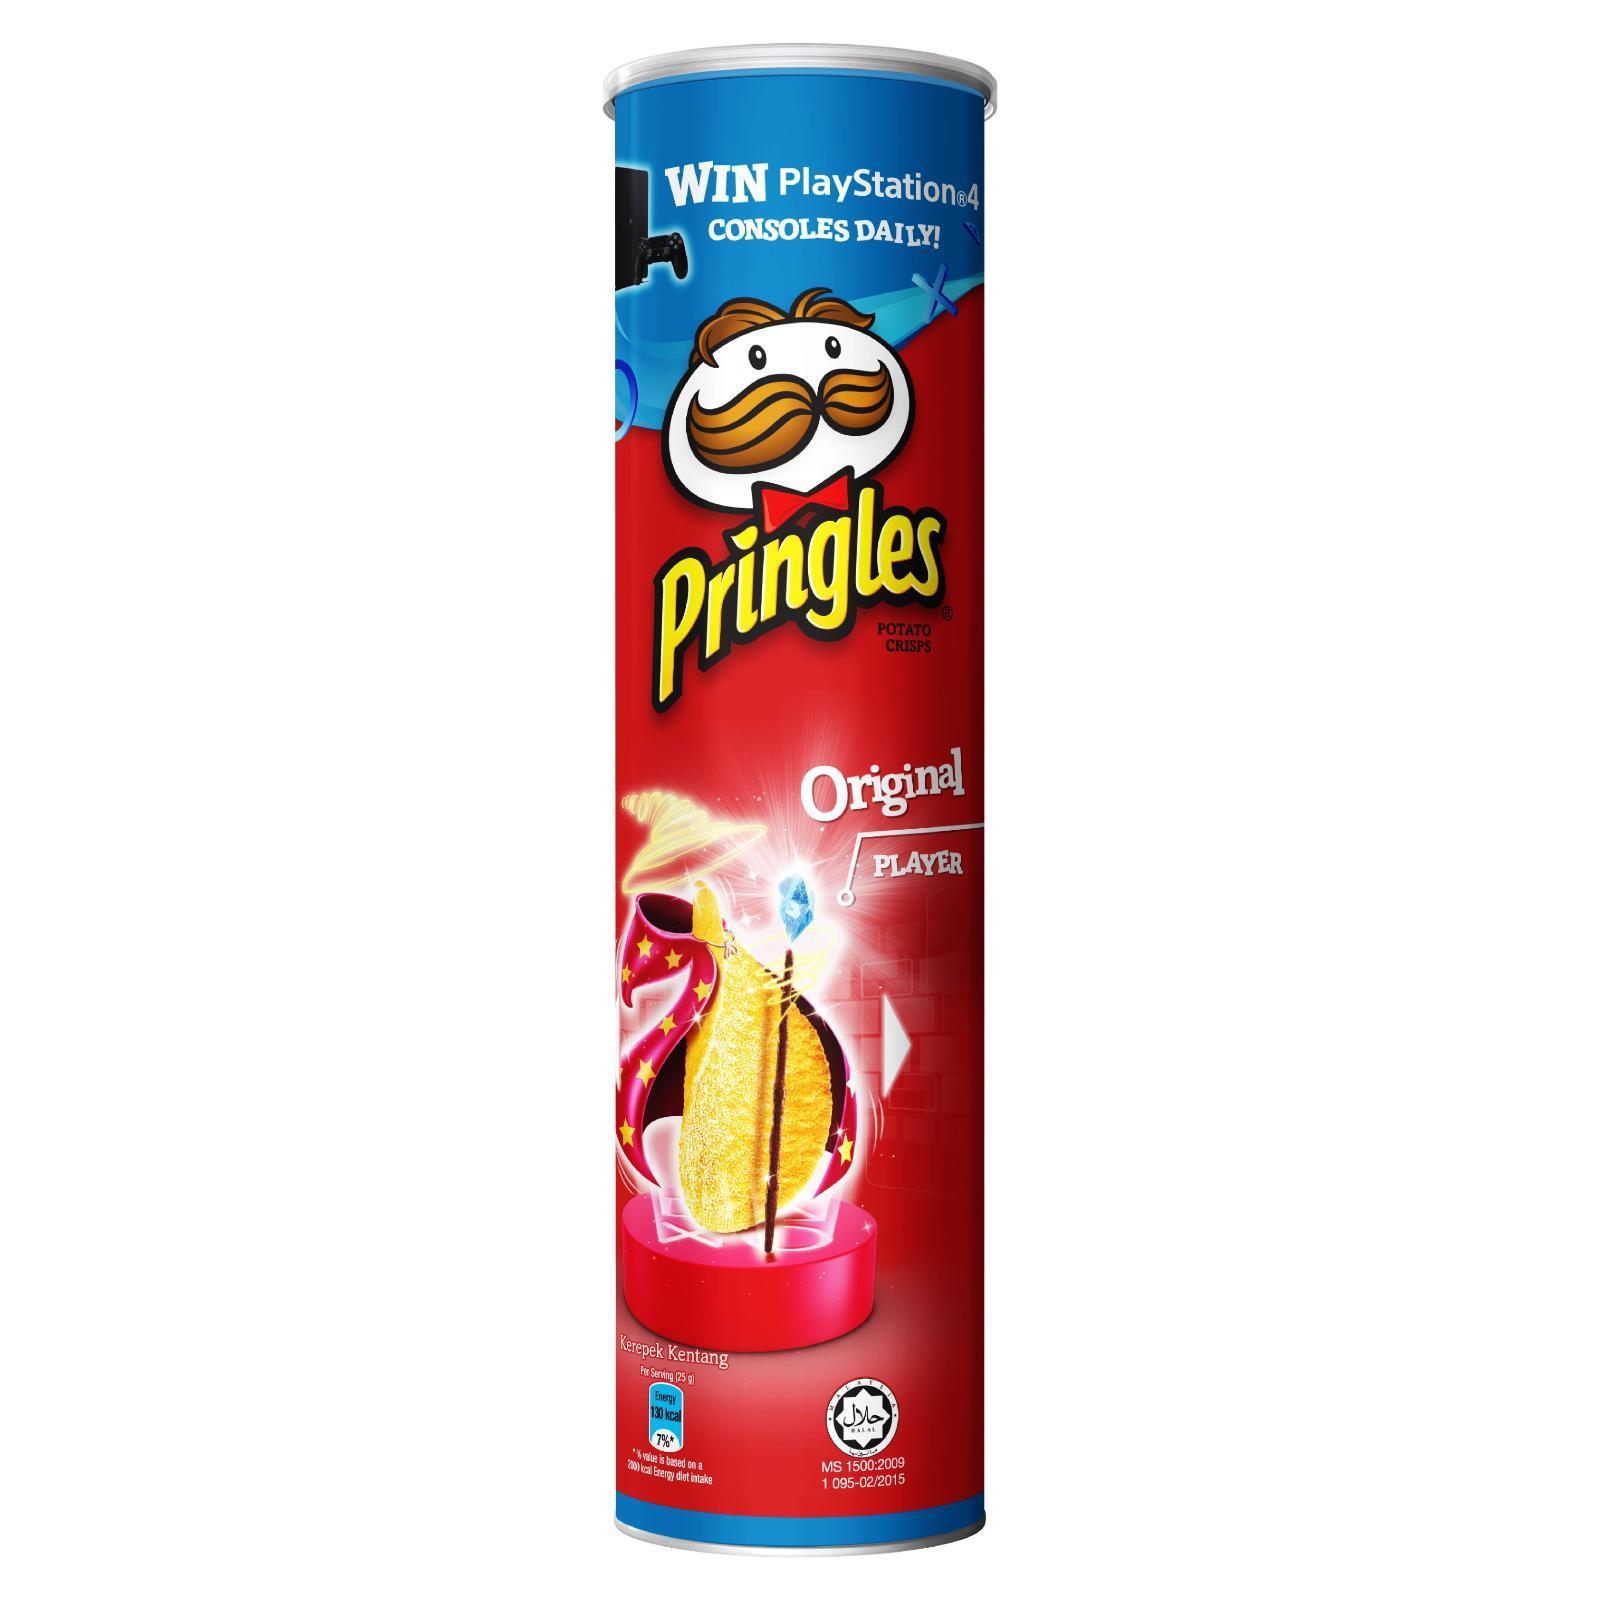 Pringles Original Potato Crisps By Redmart.